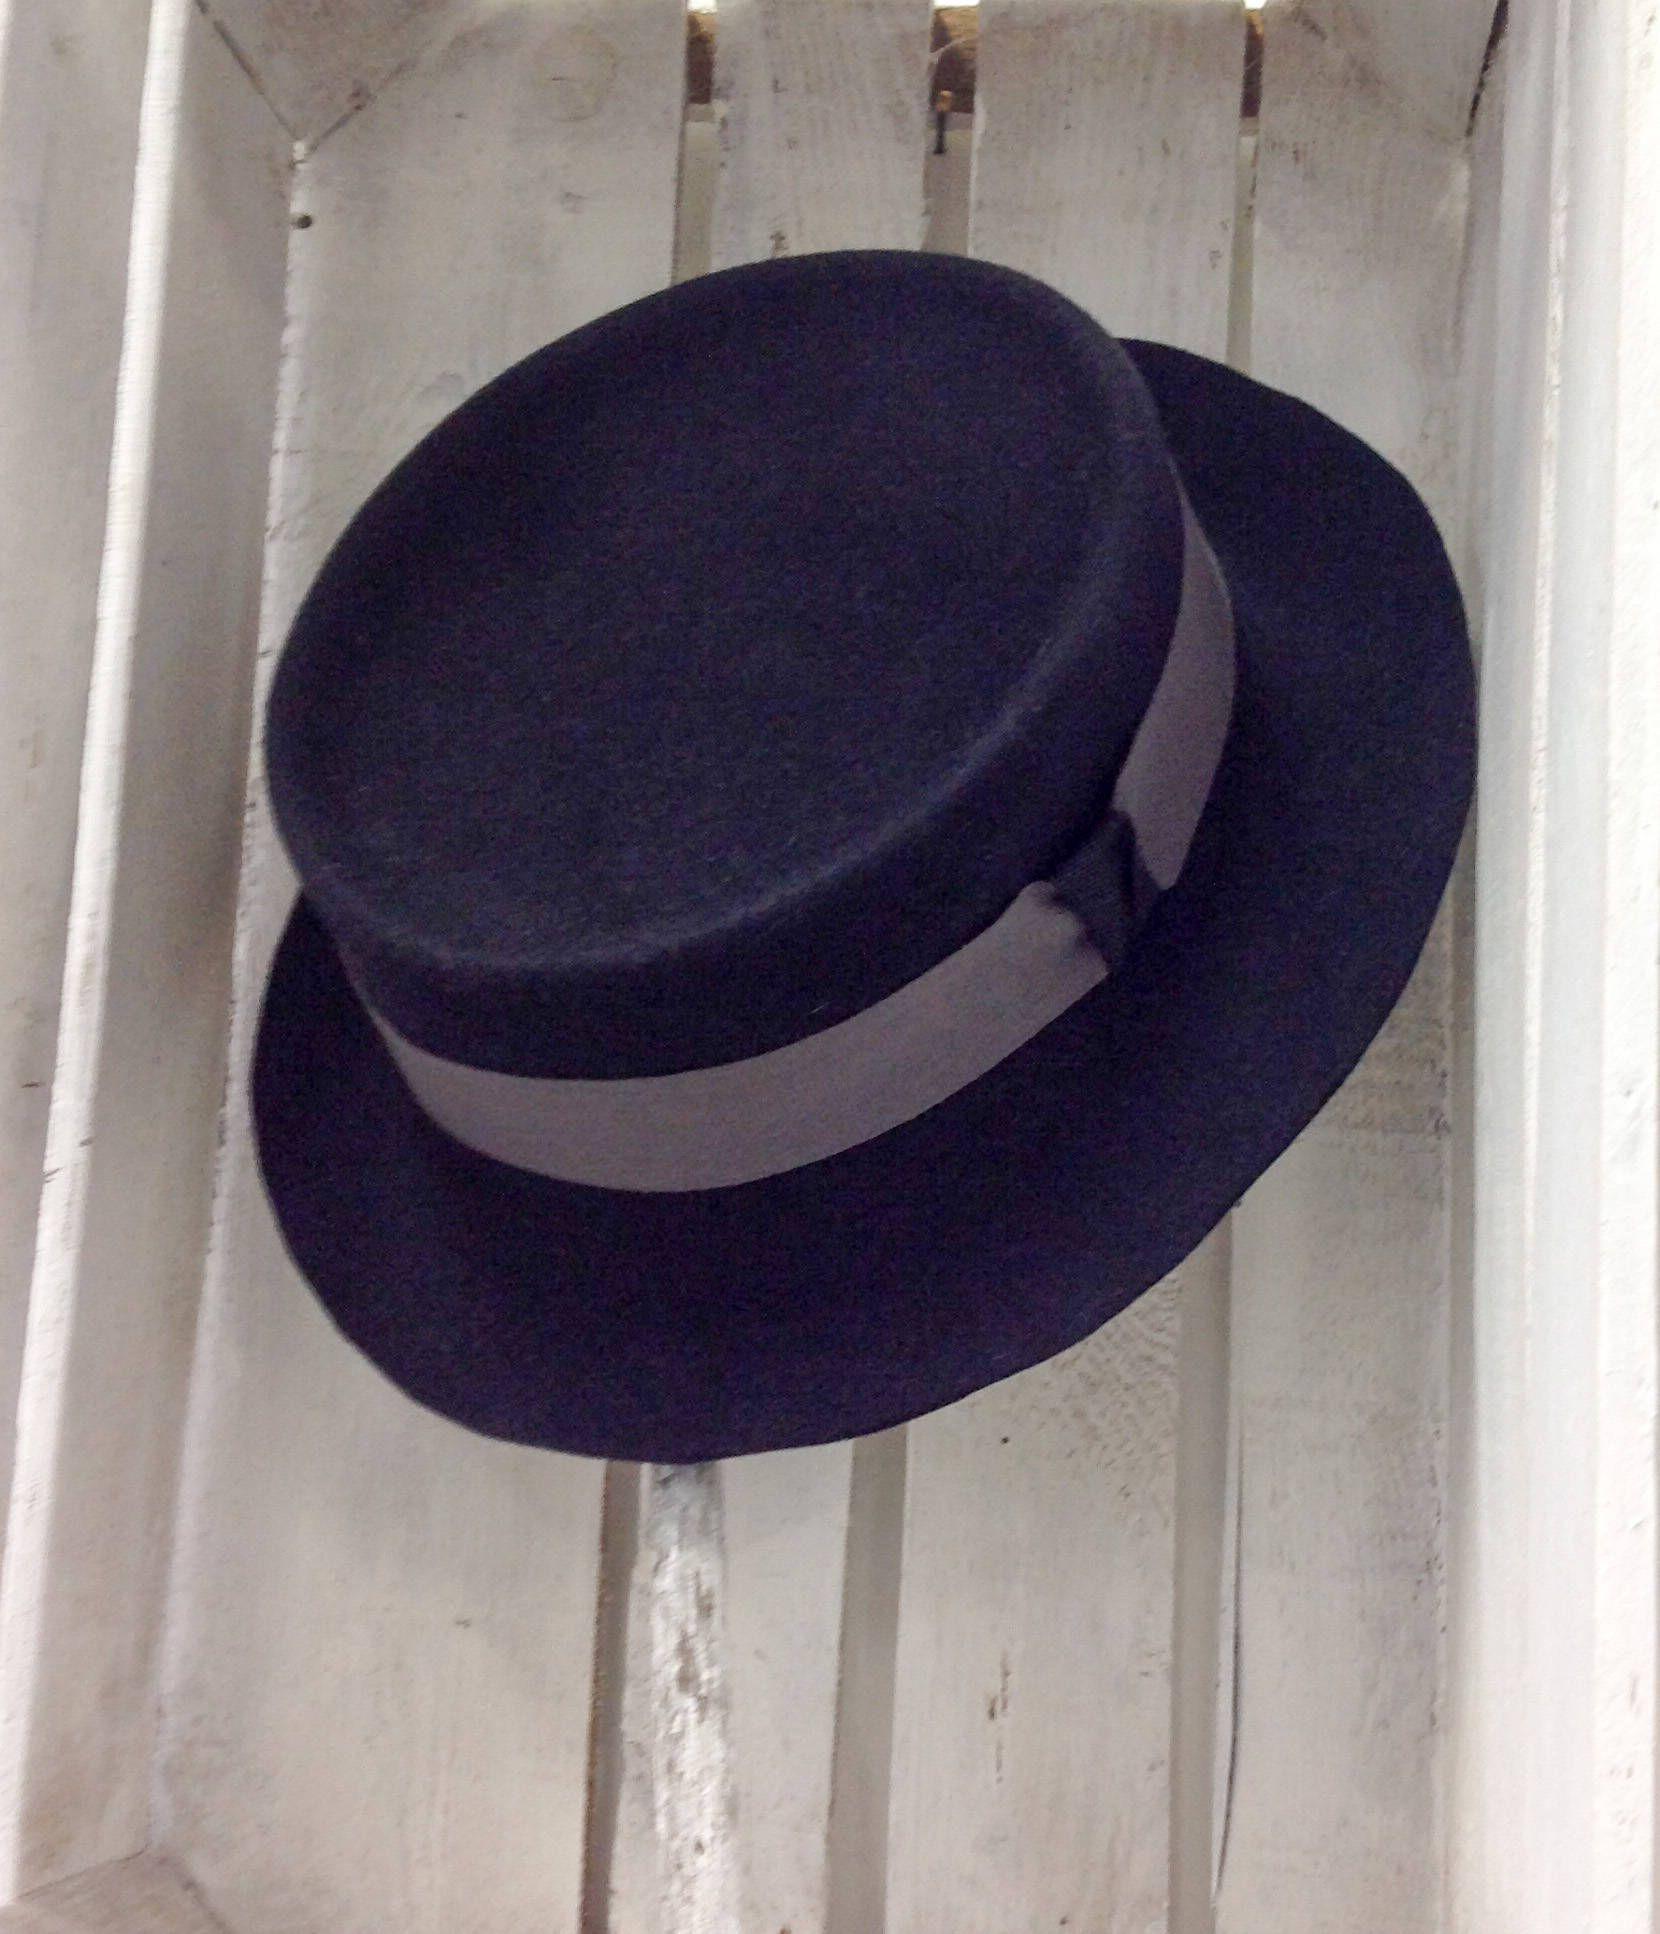 Boater Valentine s gift man Canotier felt hat Jazz hat medium brim Fedora  fashion young men Gift 1f03586c377e